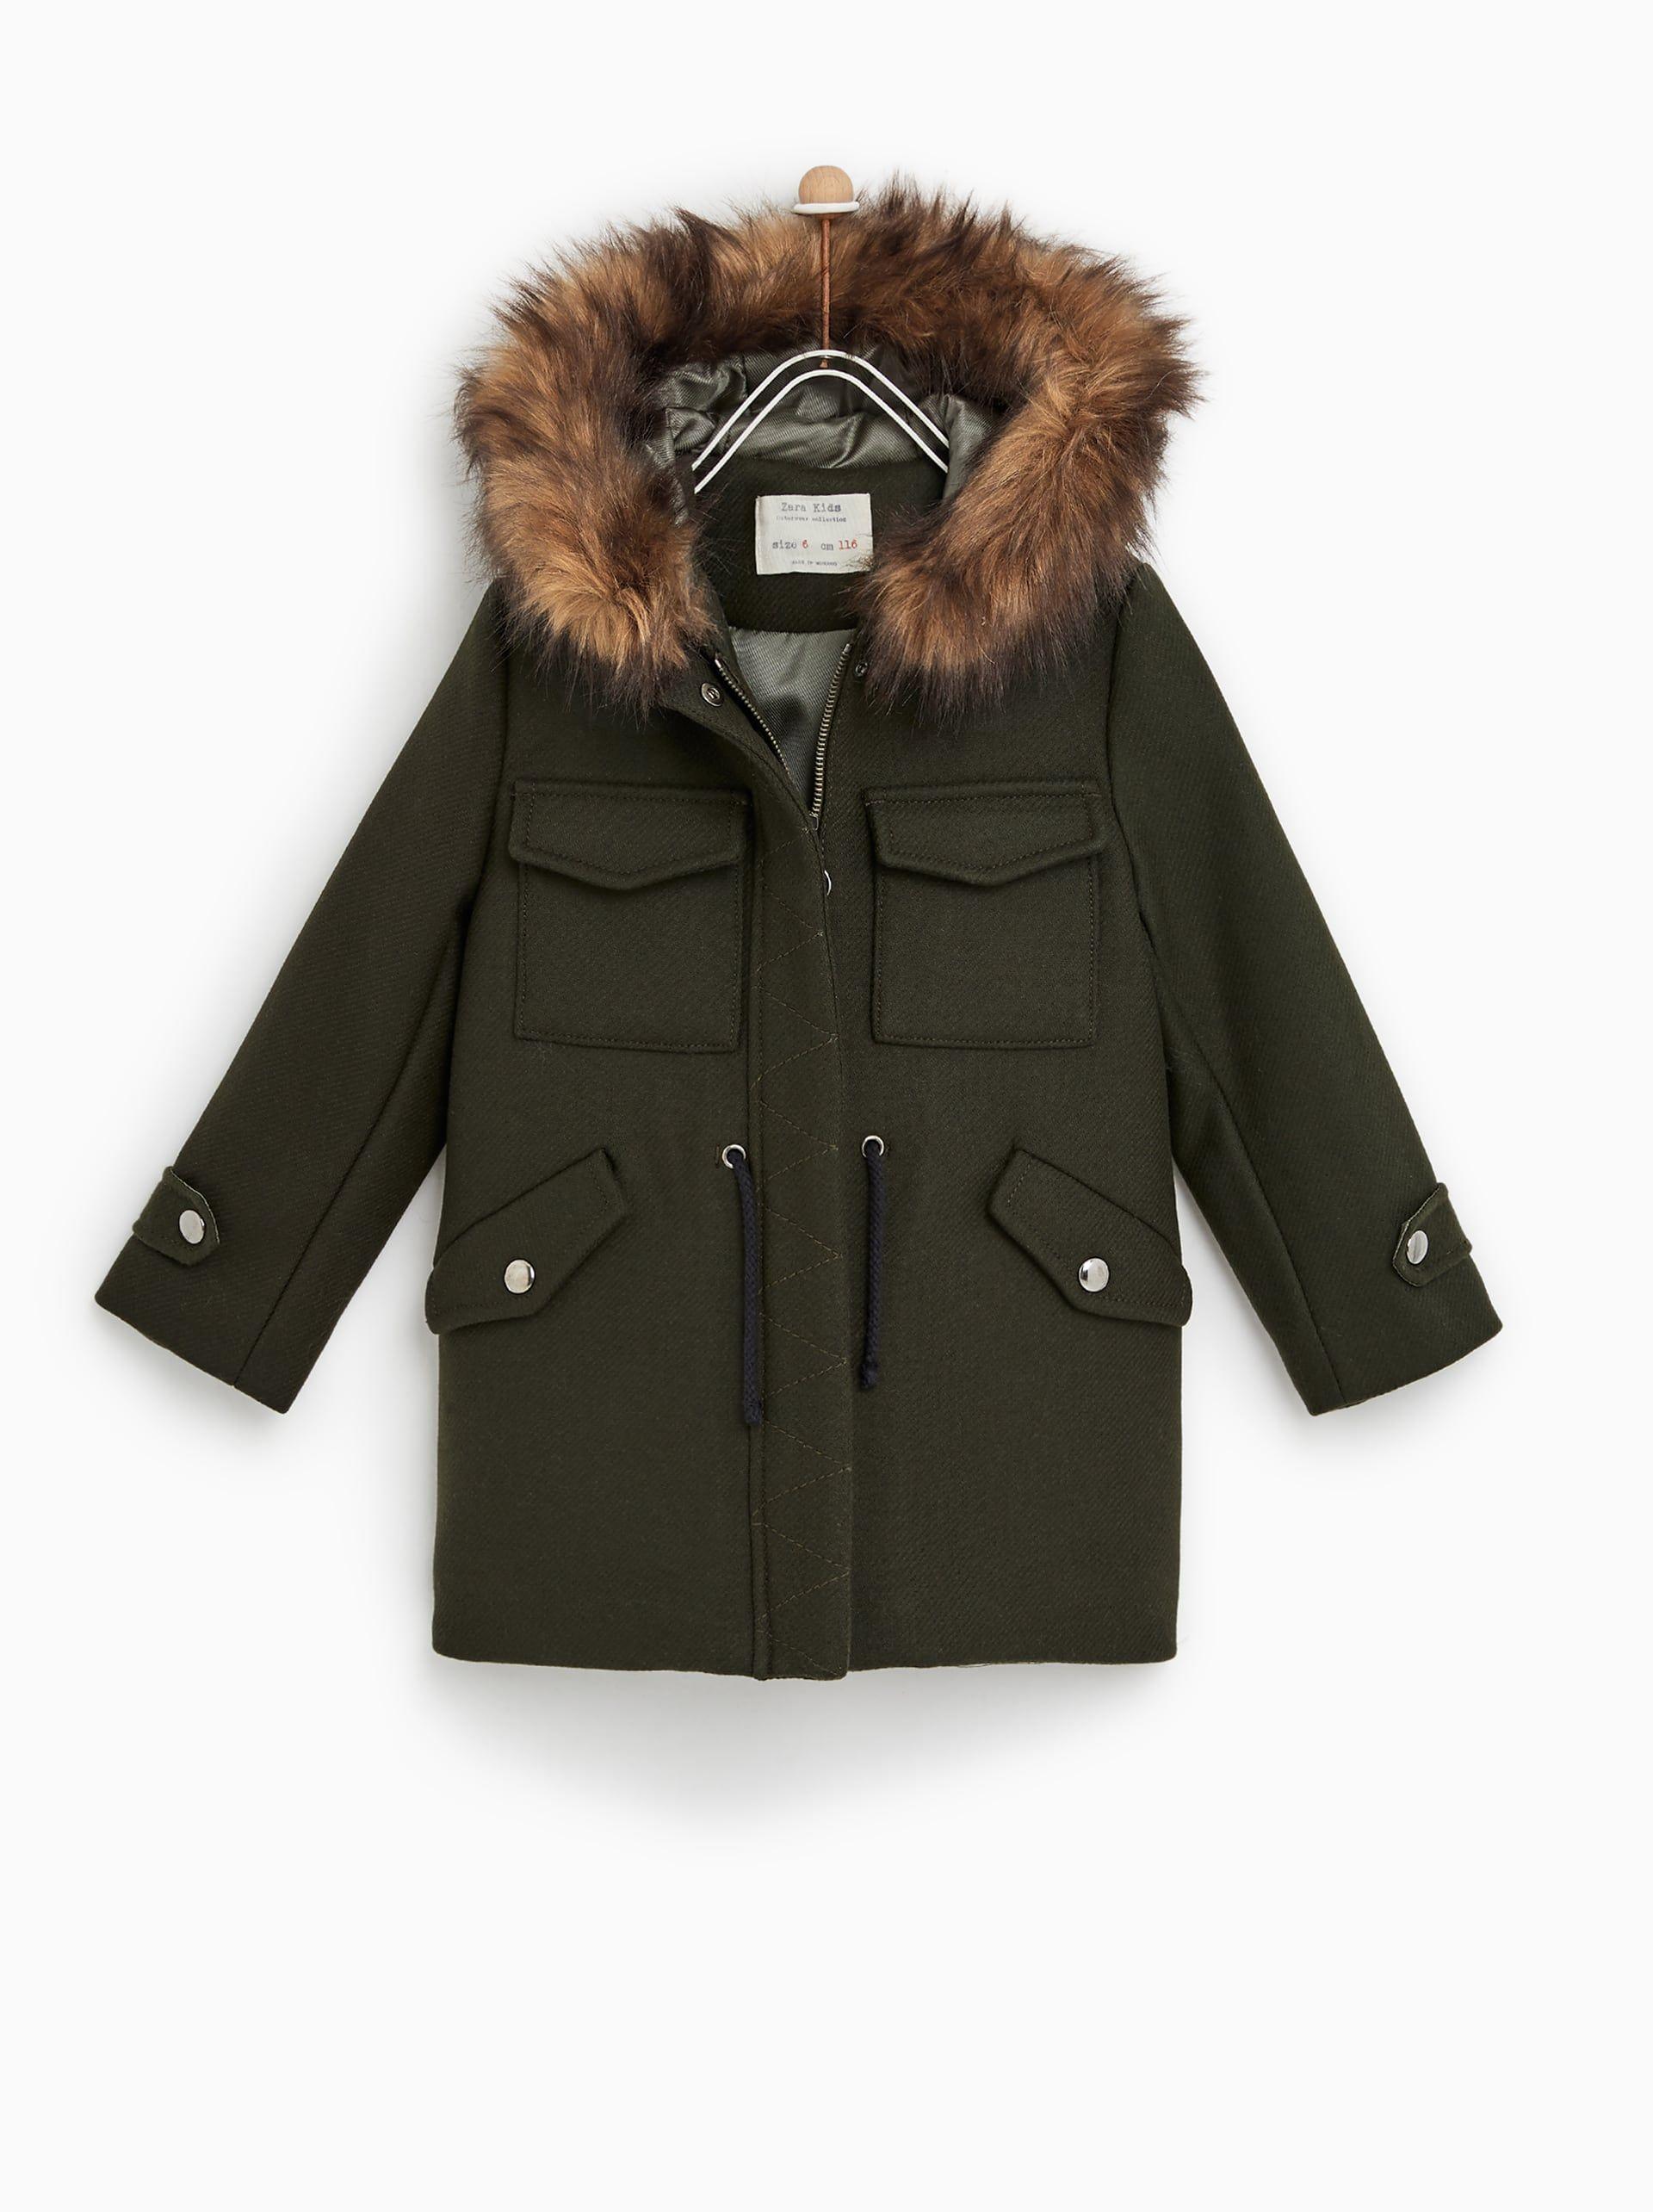 caec474d Image 1 of WOOL DUFFEL COAT from Zara | Outerwear - kids | Duffle ...